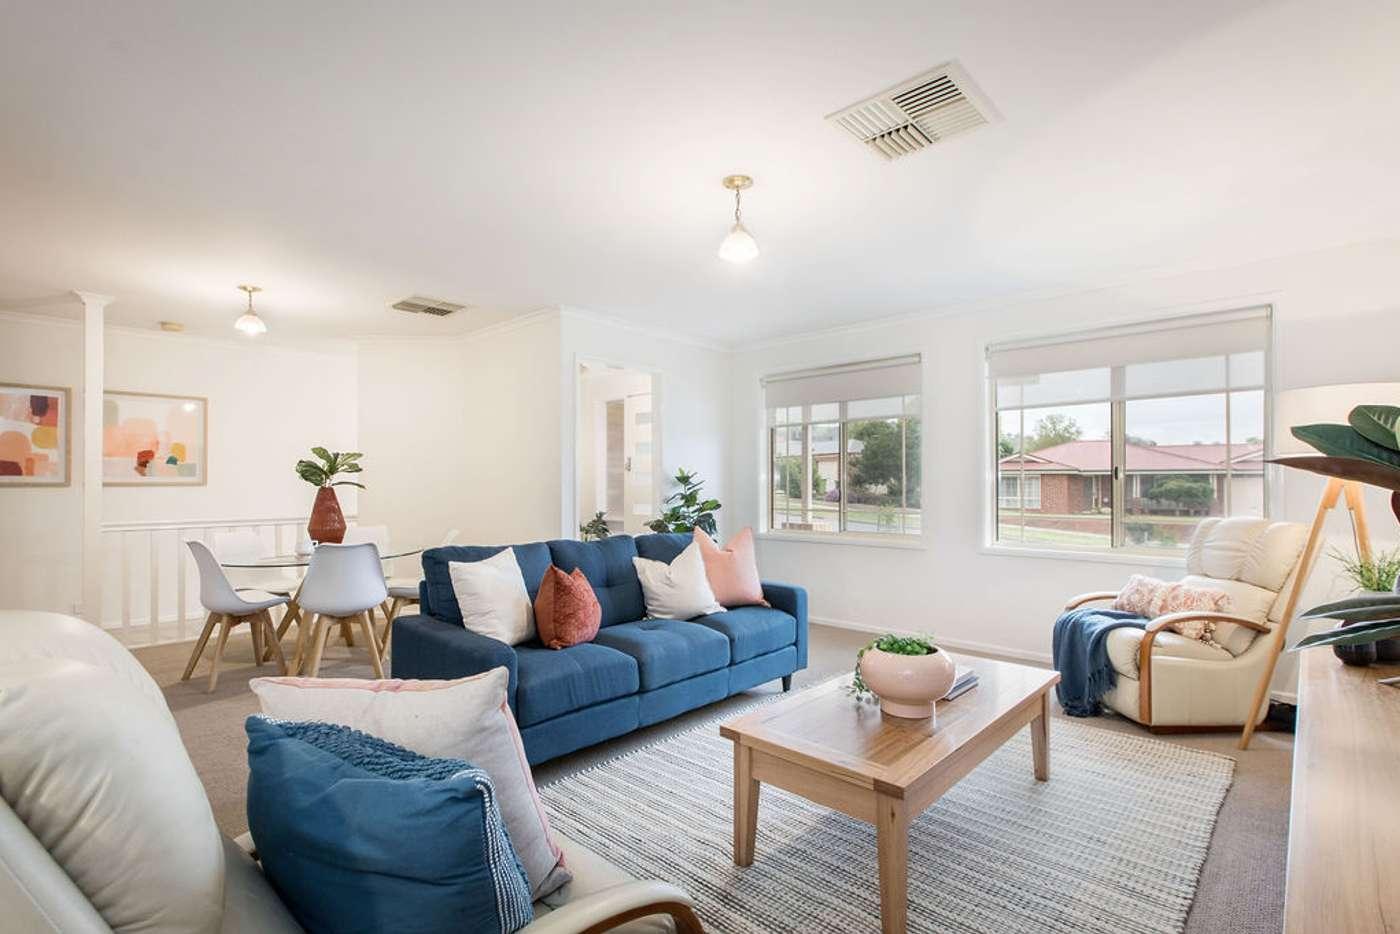 Sixth view of Homely house listing, 4 Falcon Circuit, Wodonga VIC 3690